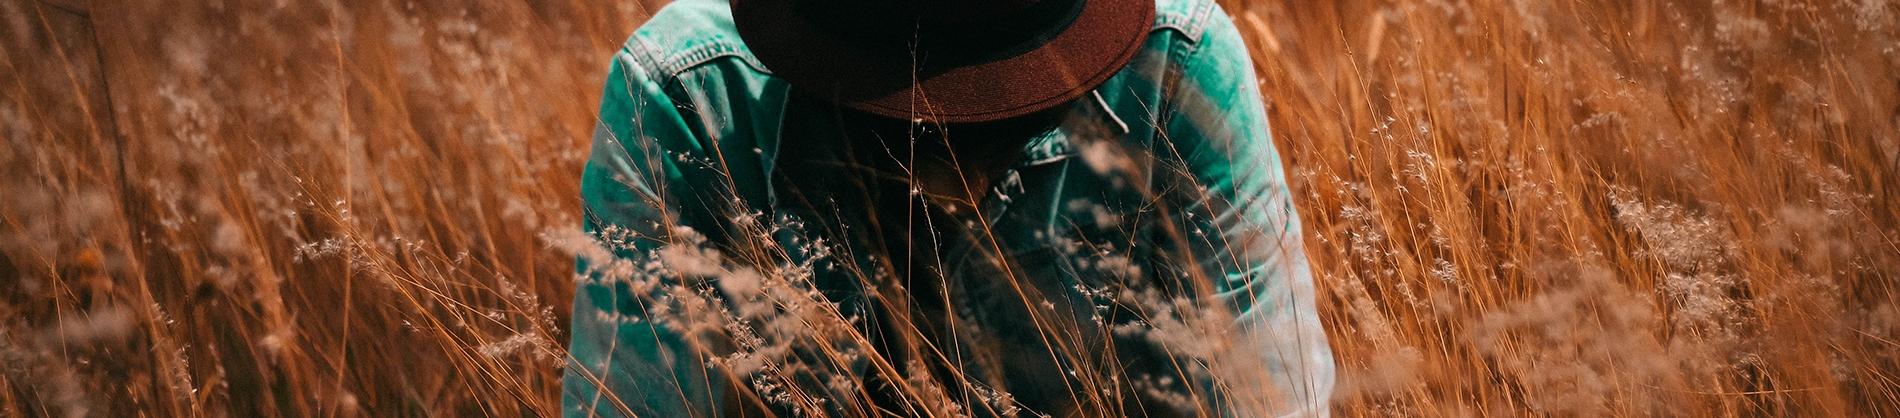 Man knelt down in a field